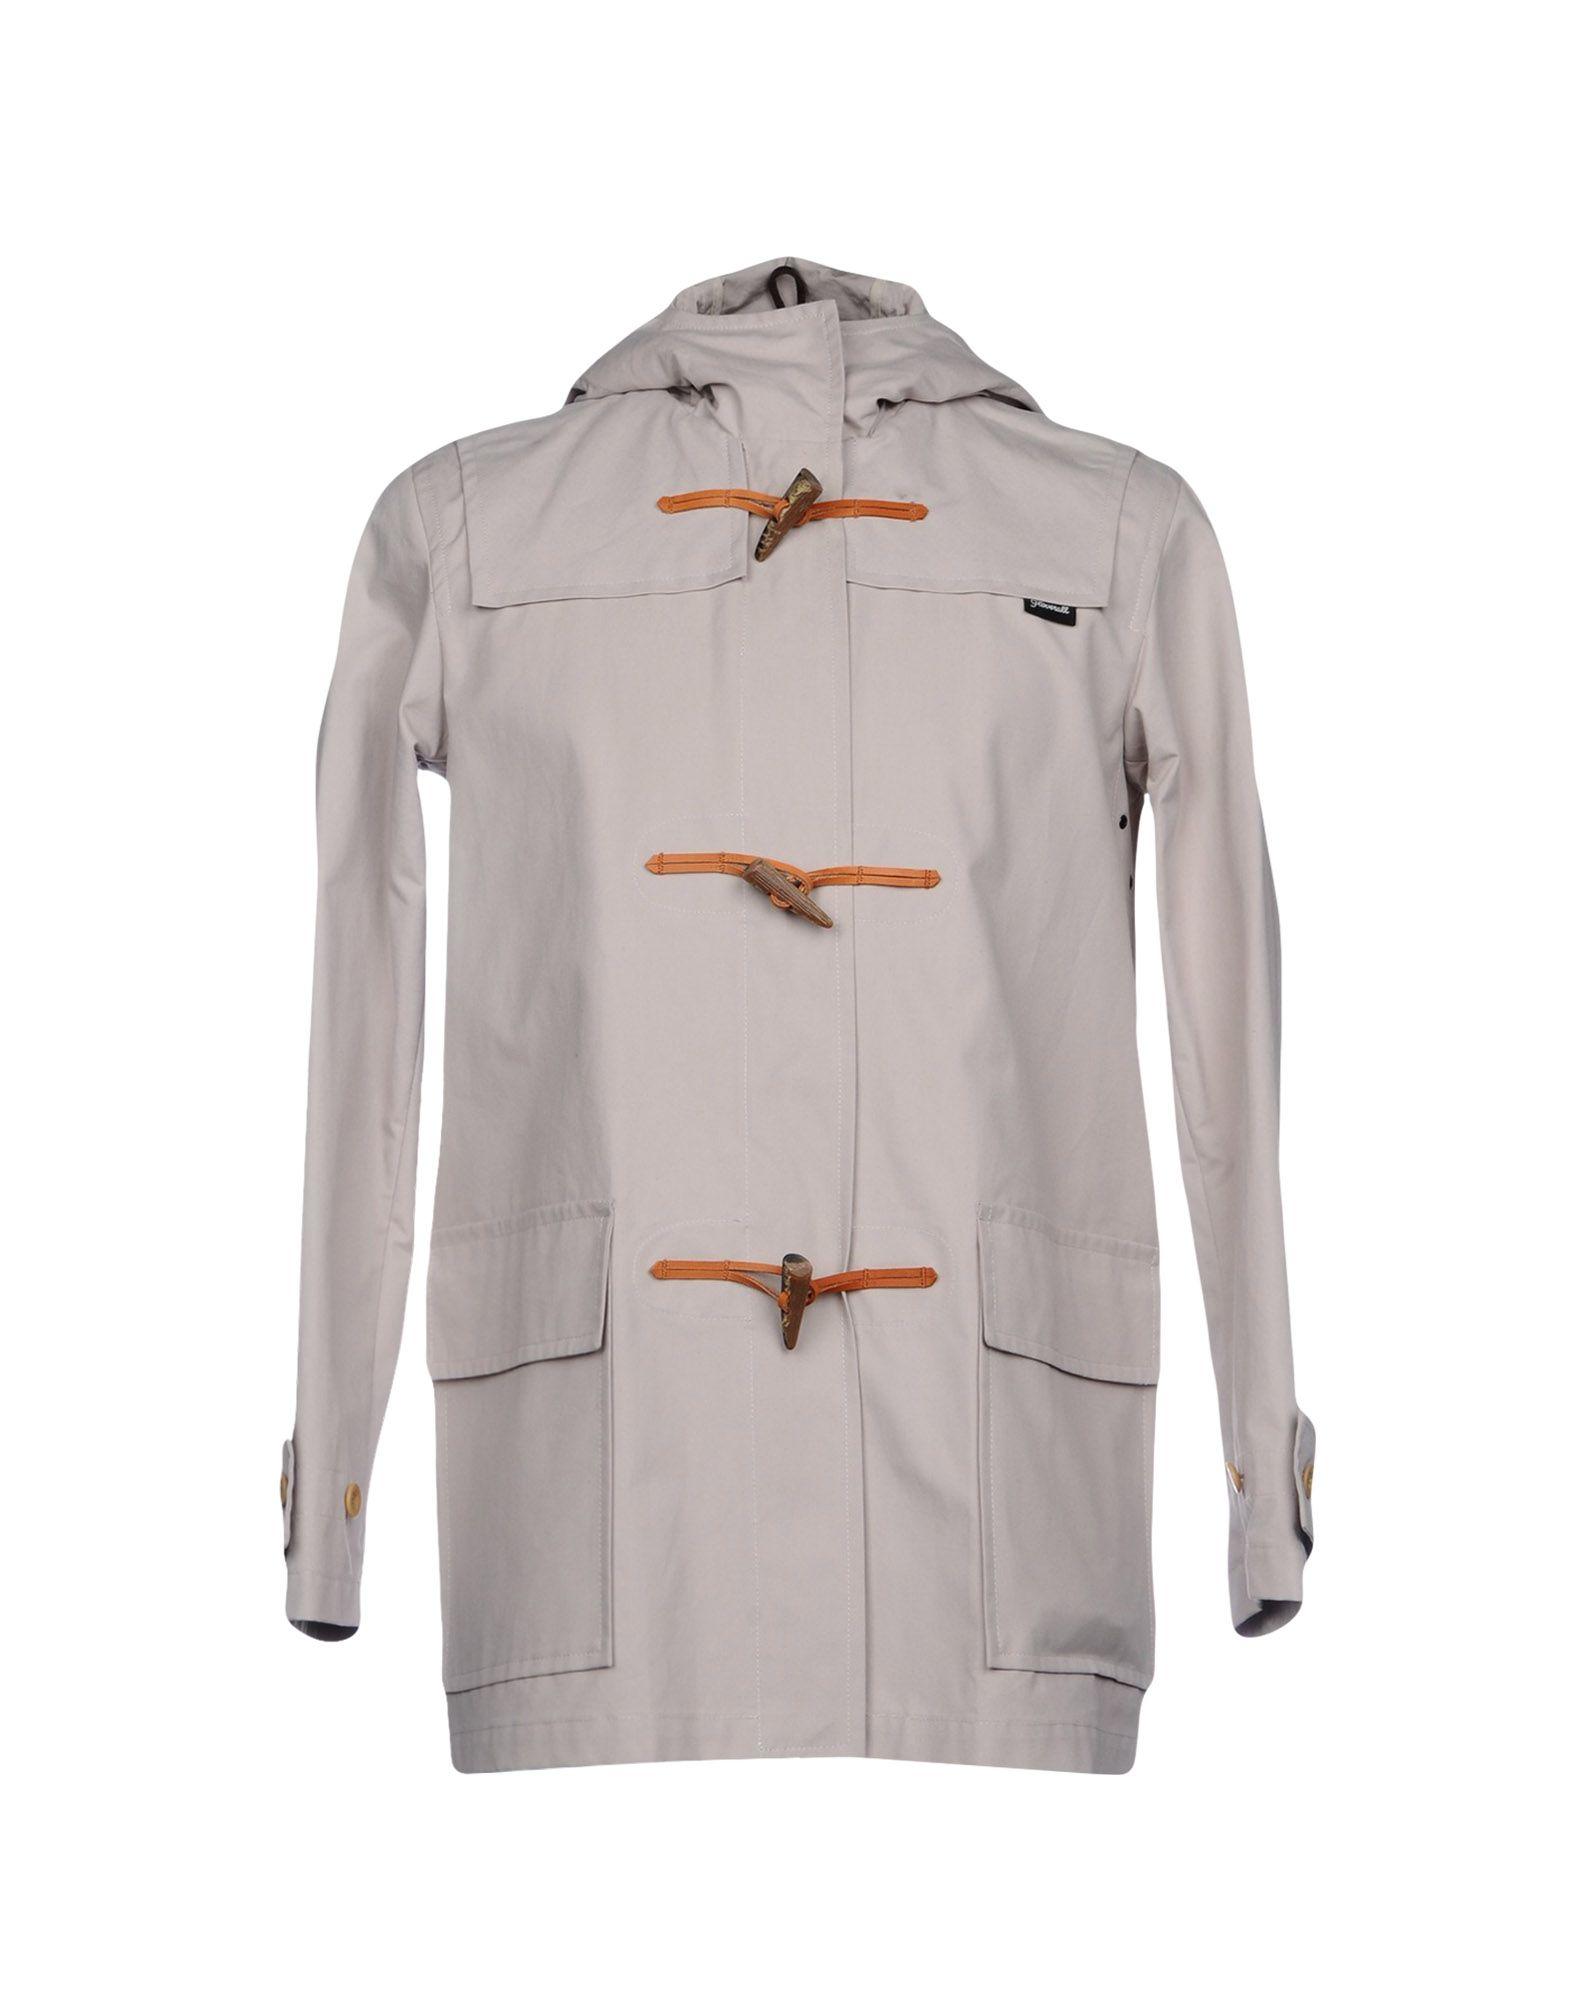 GLOVERALL Duffle Coat in Light Grey